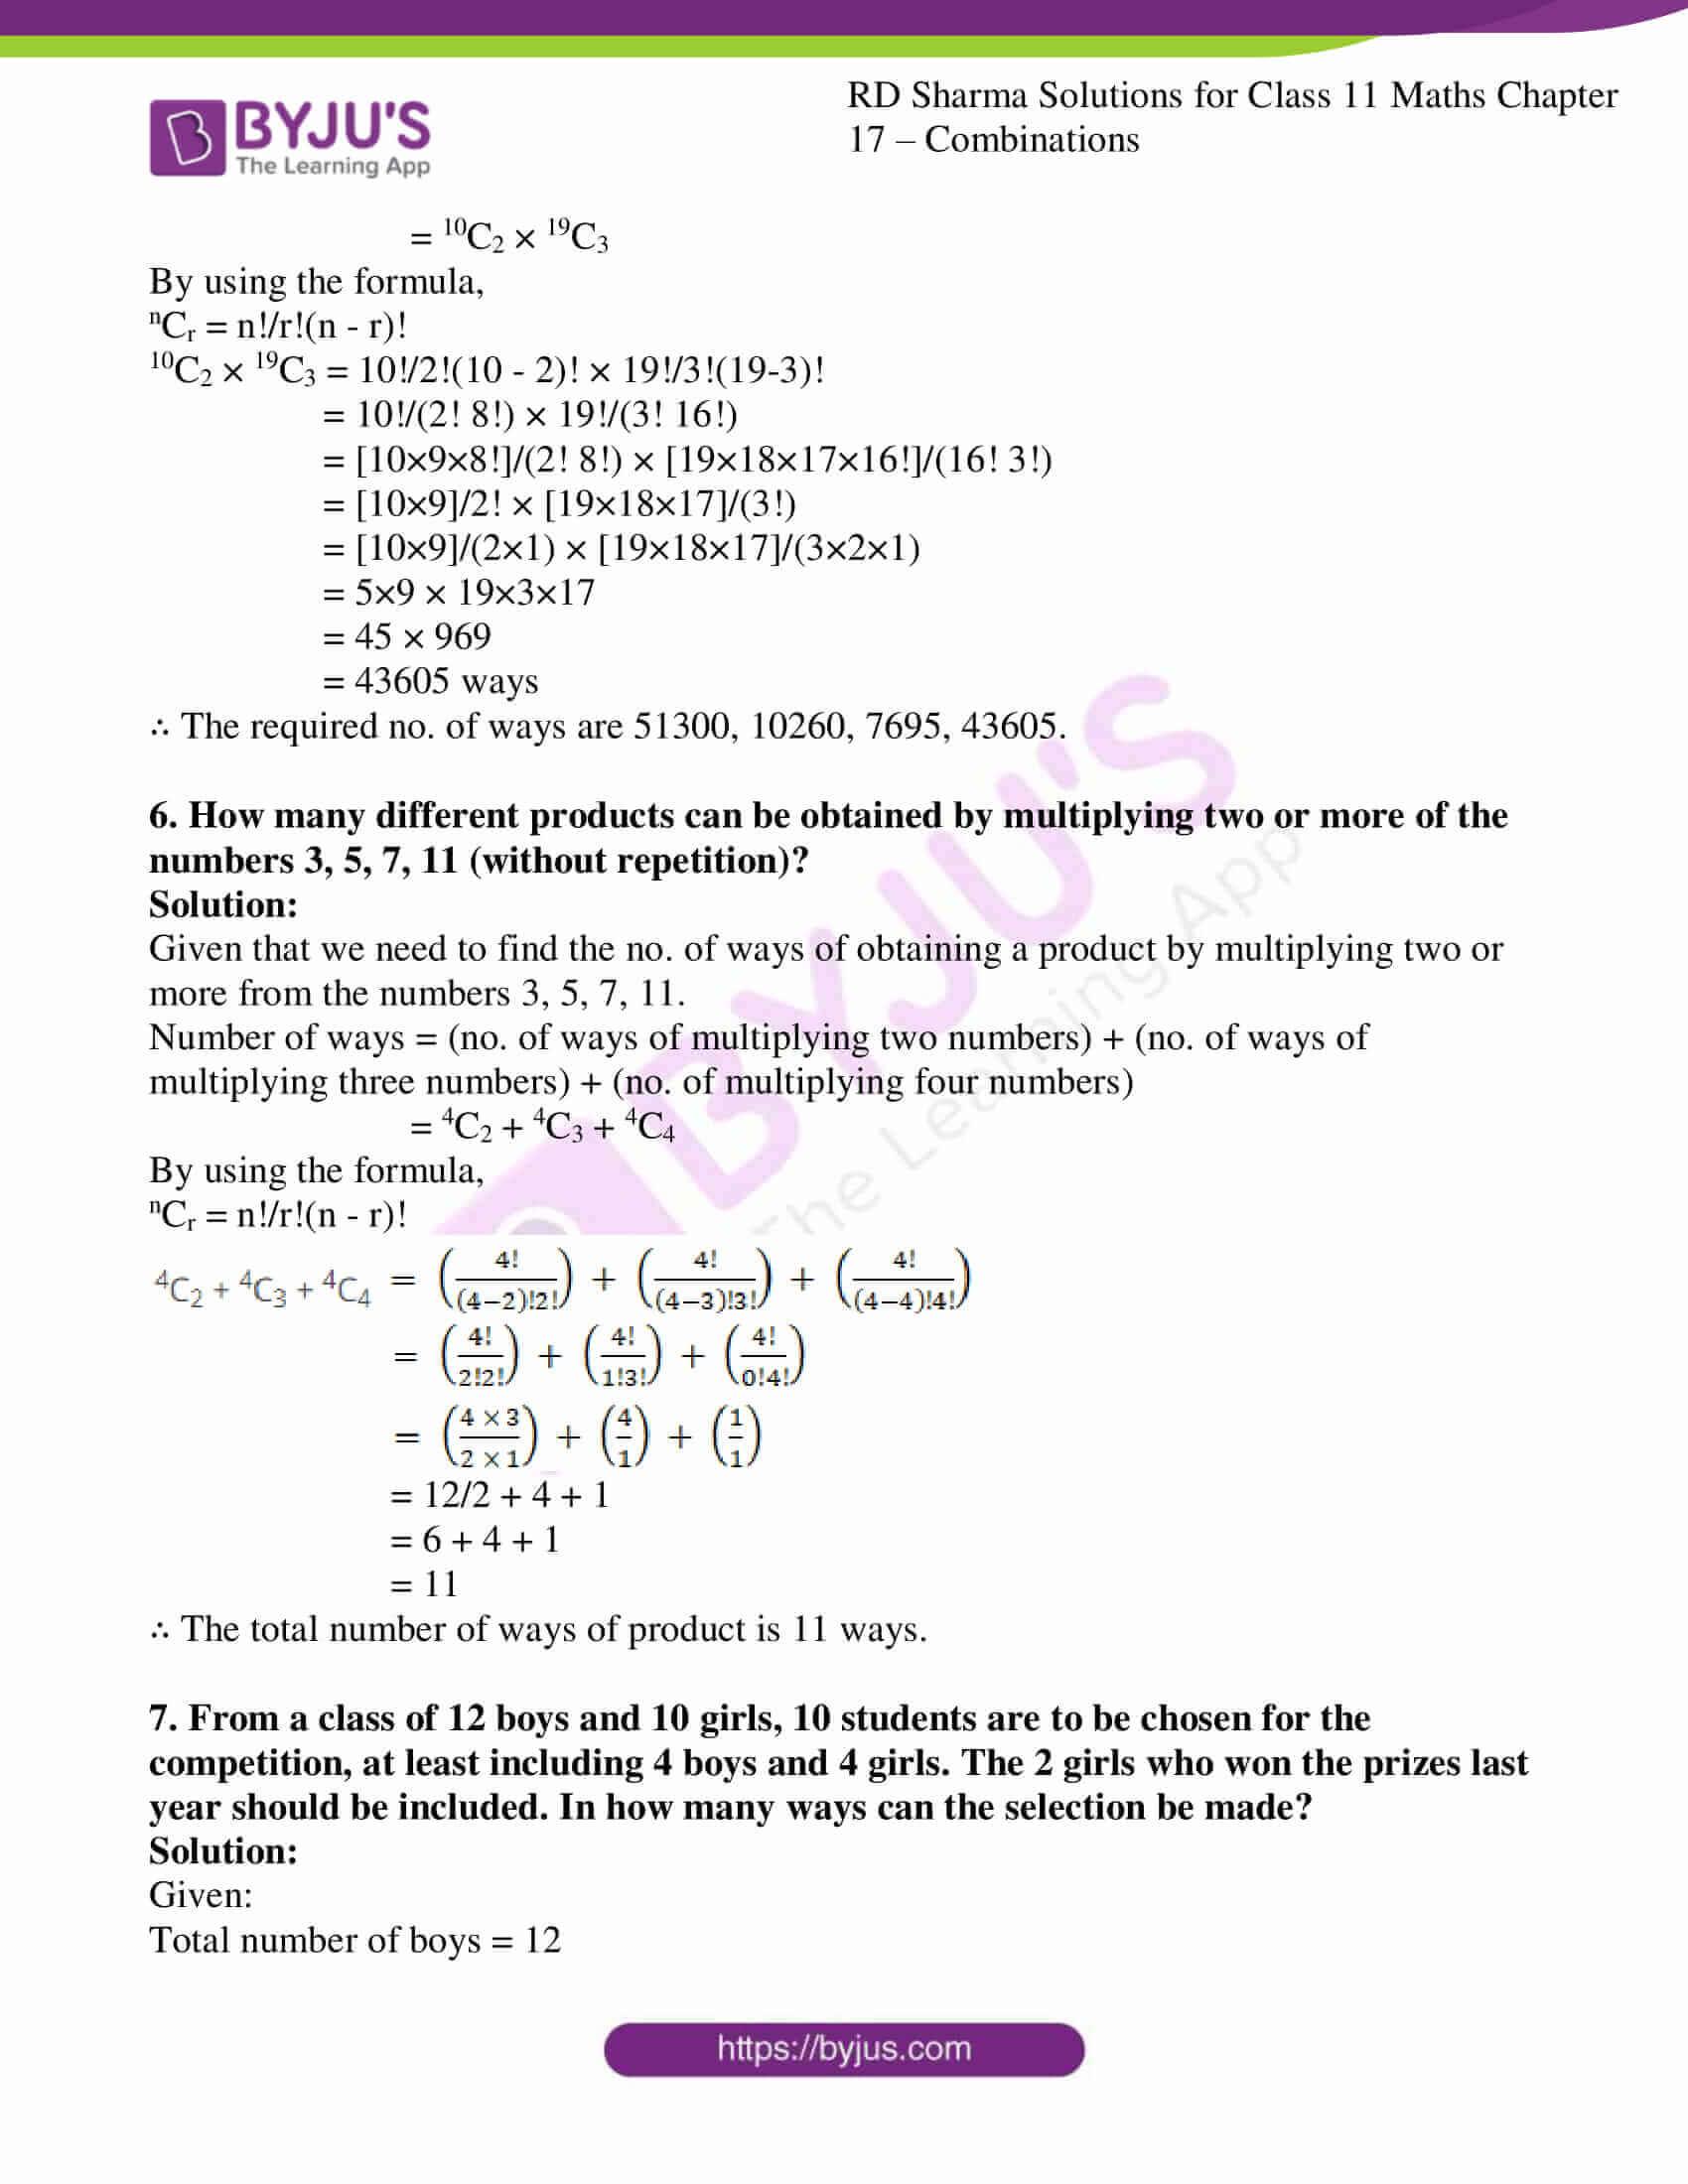 rd sharma class 11 maths ch 17 ex 2 05